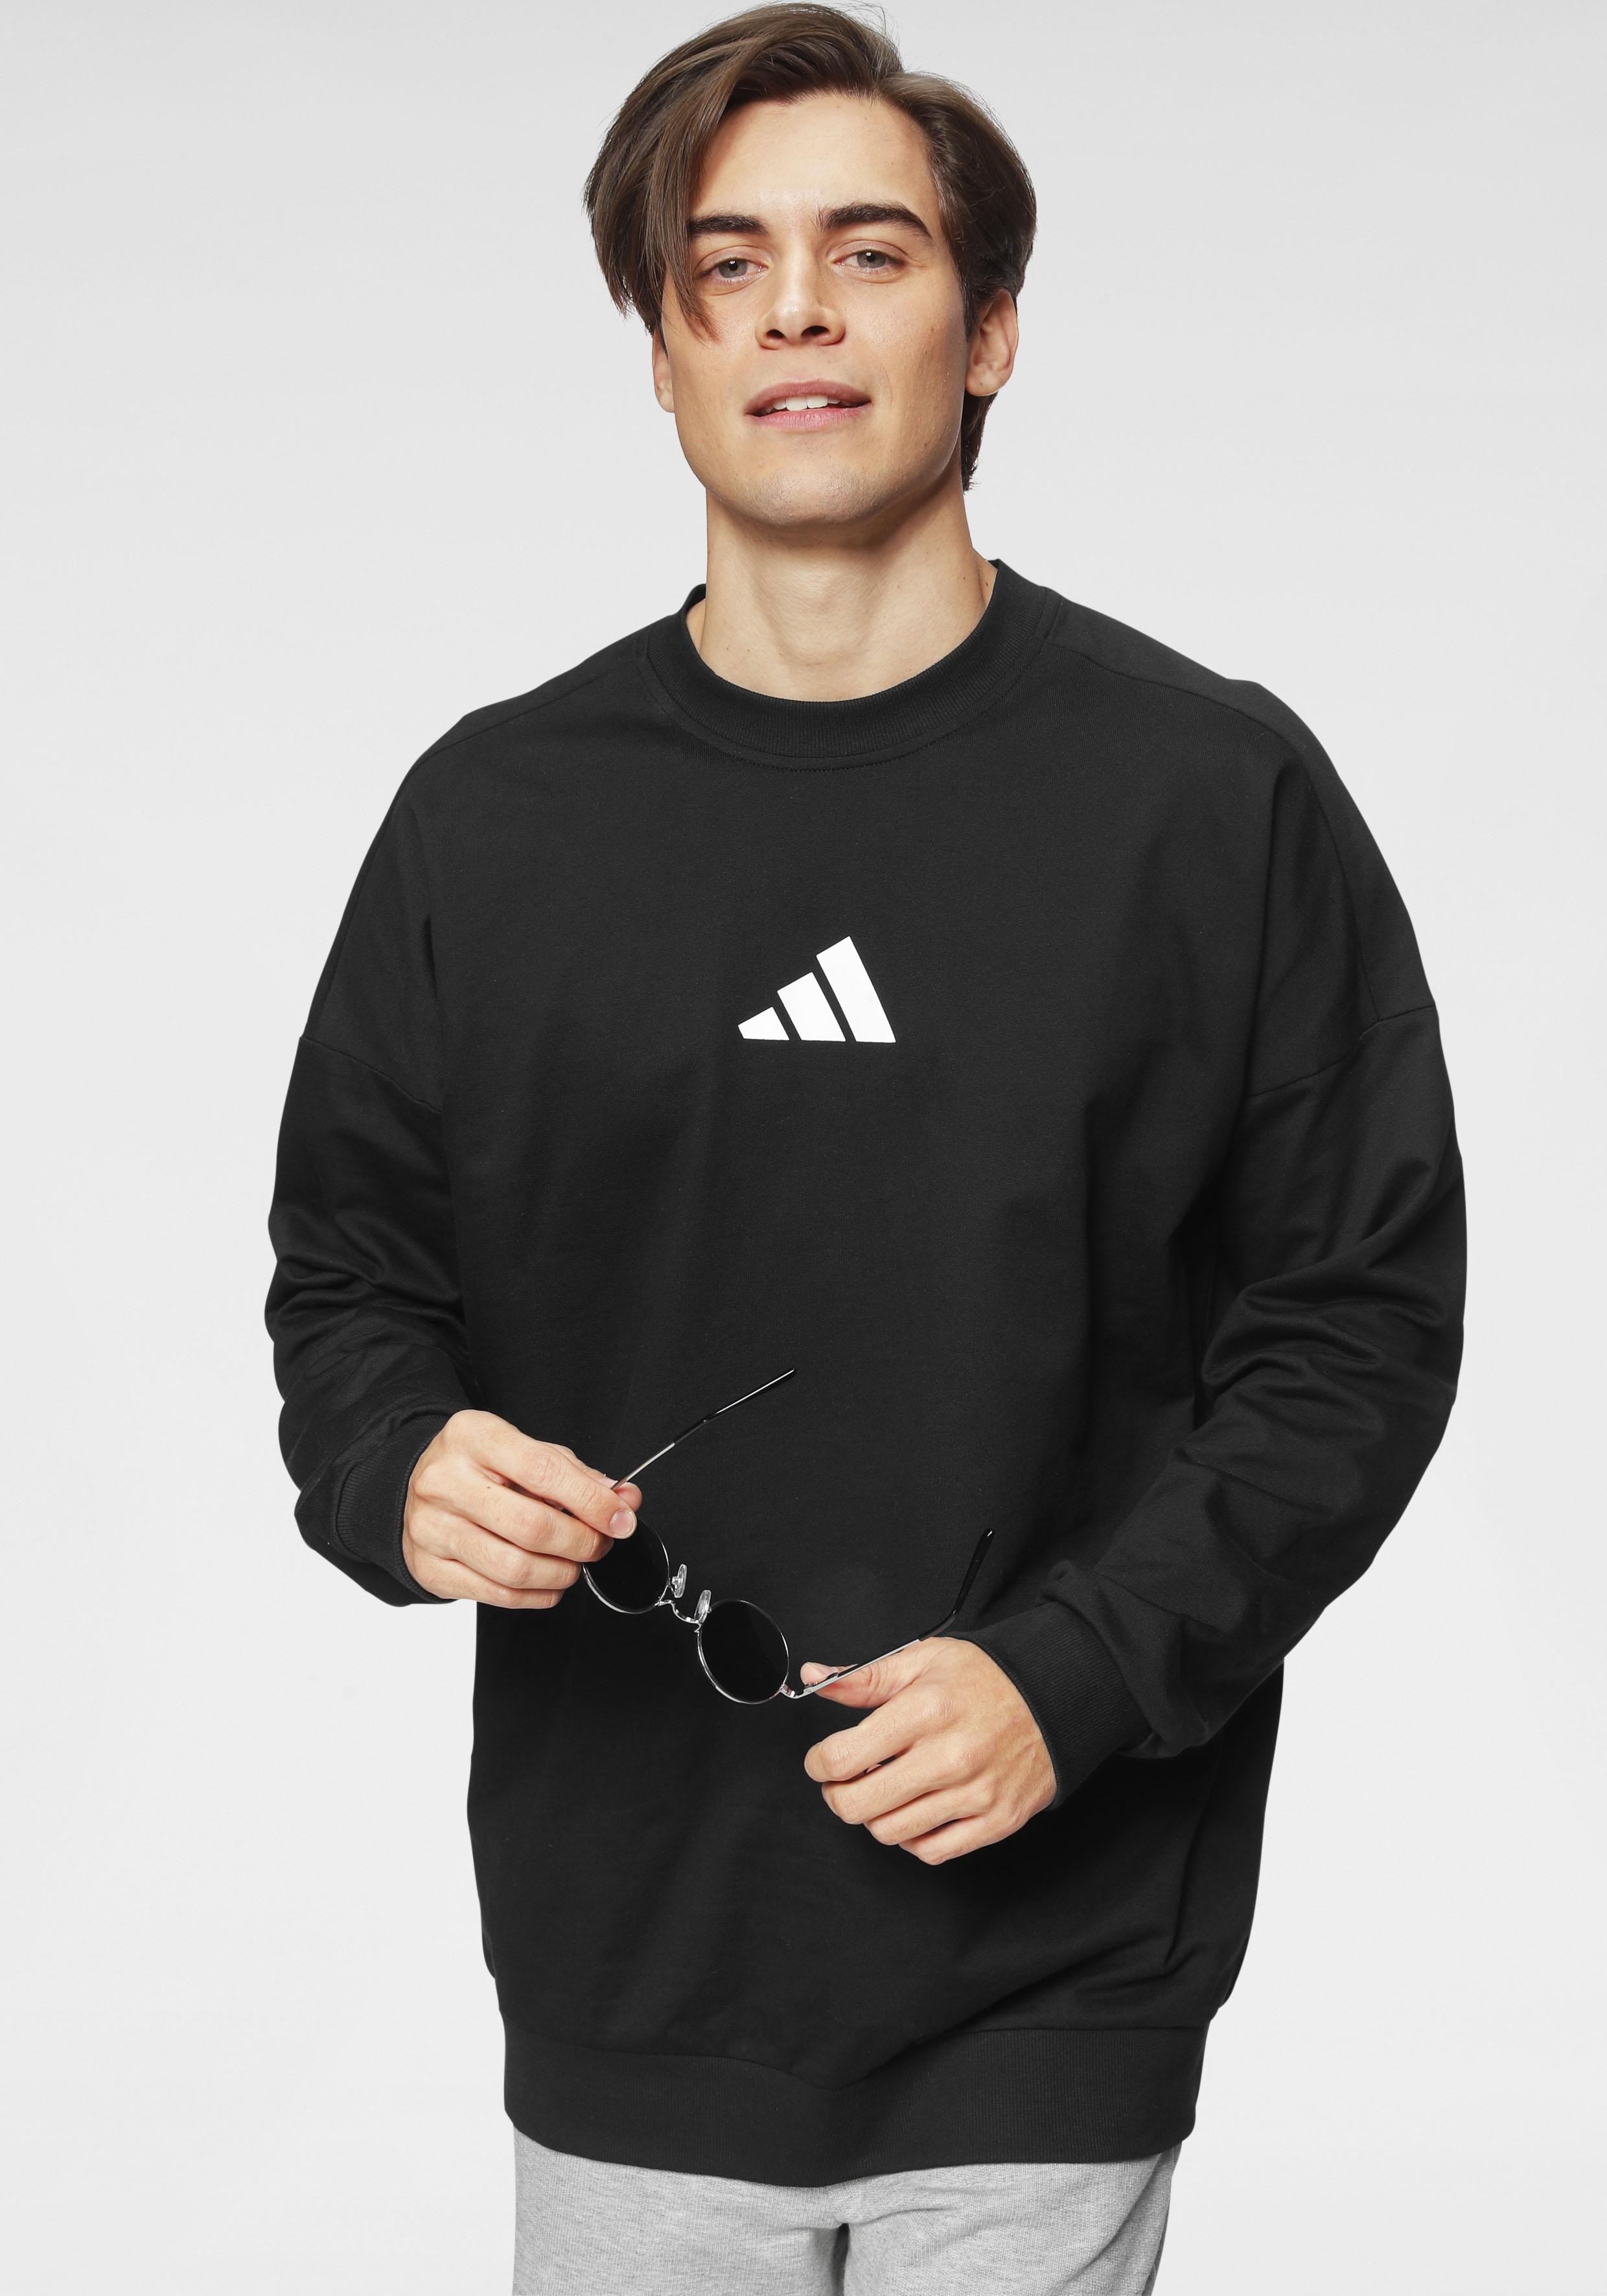 adidas Performance Sweatshirt TIGER CREW schwarz Herren Sweatshirts -jacken